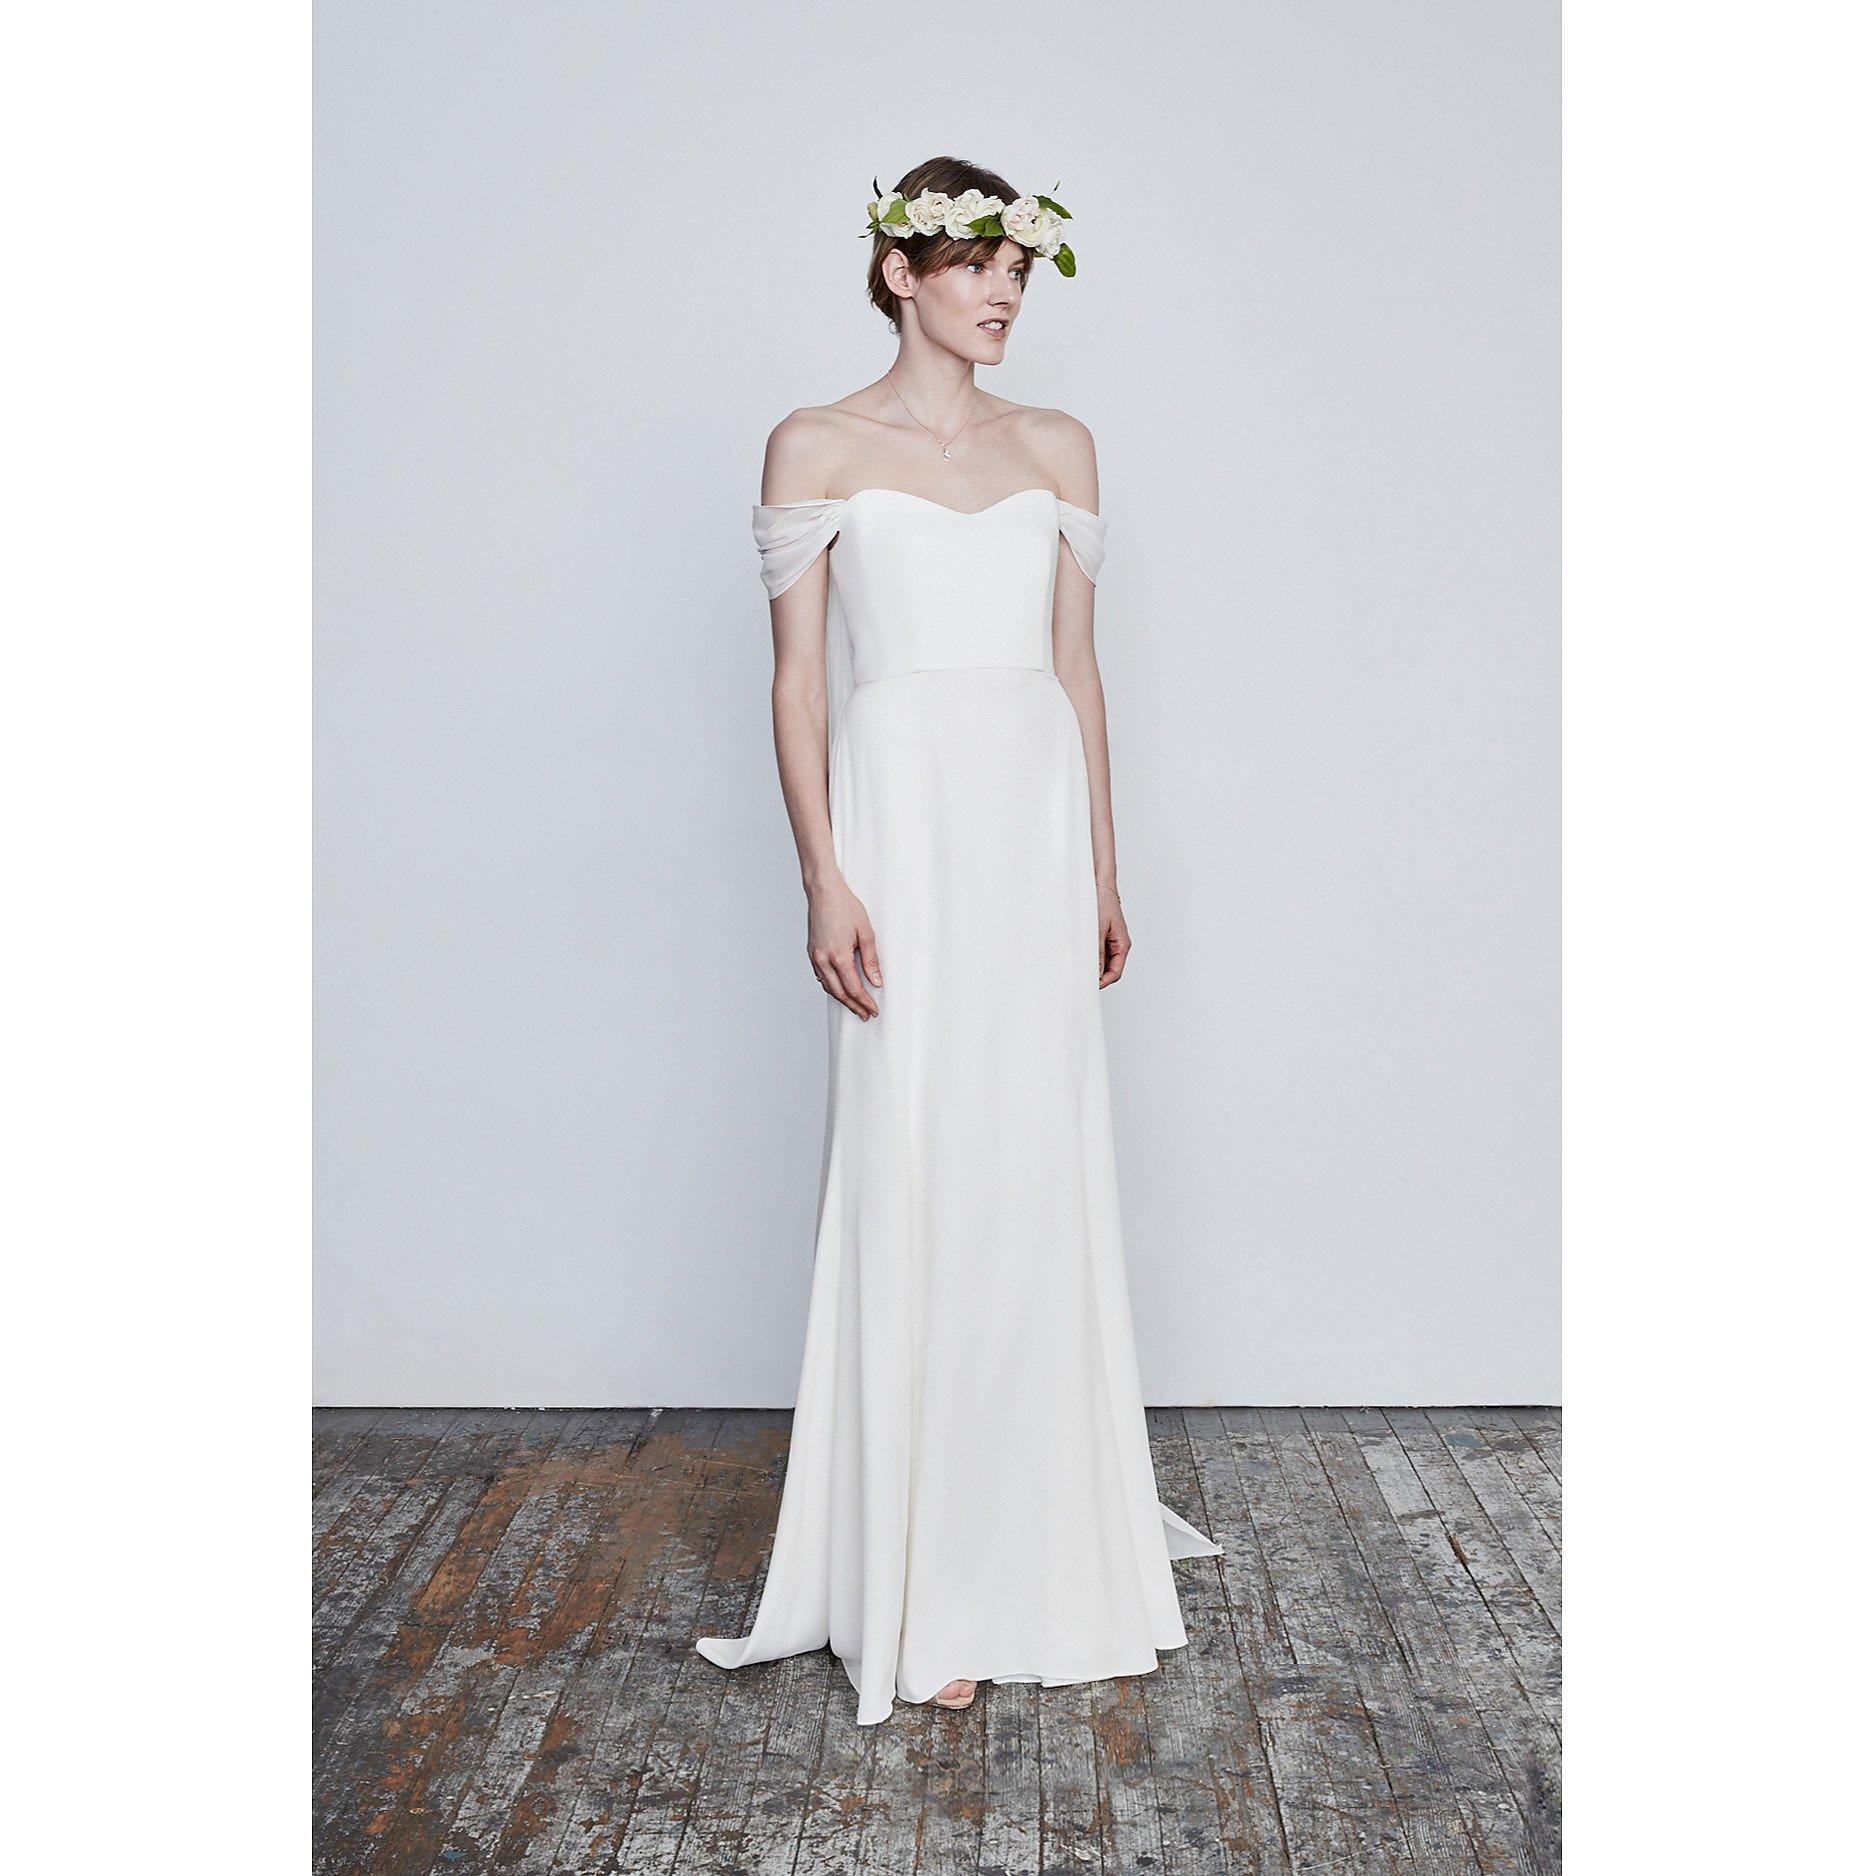 Savannah Miller Cecily Bridal Dress